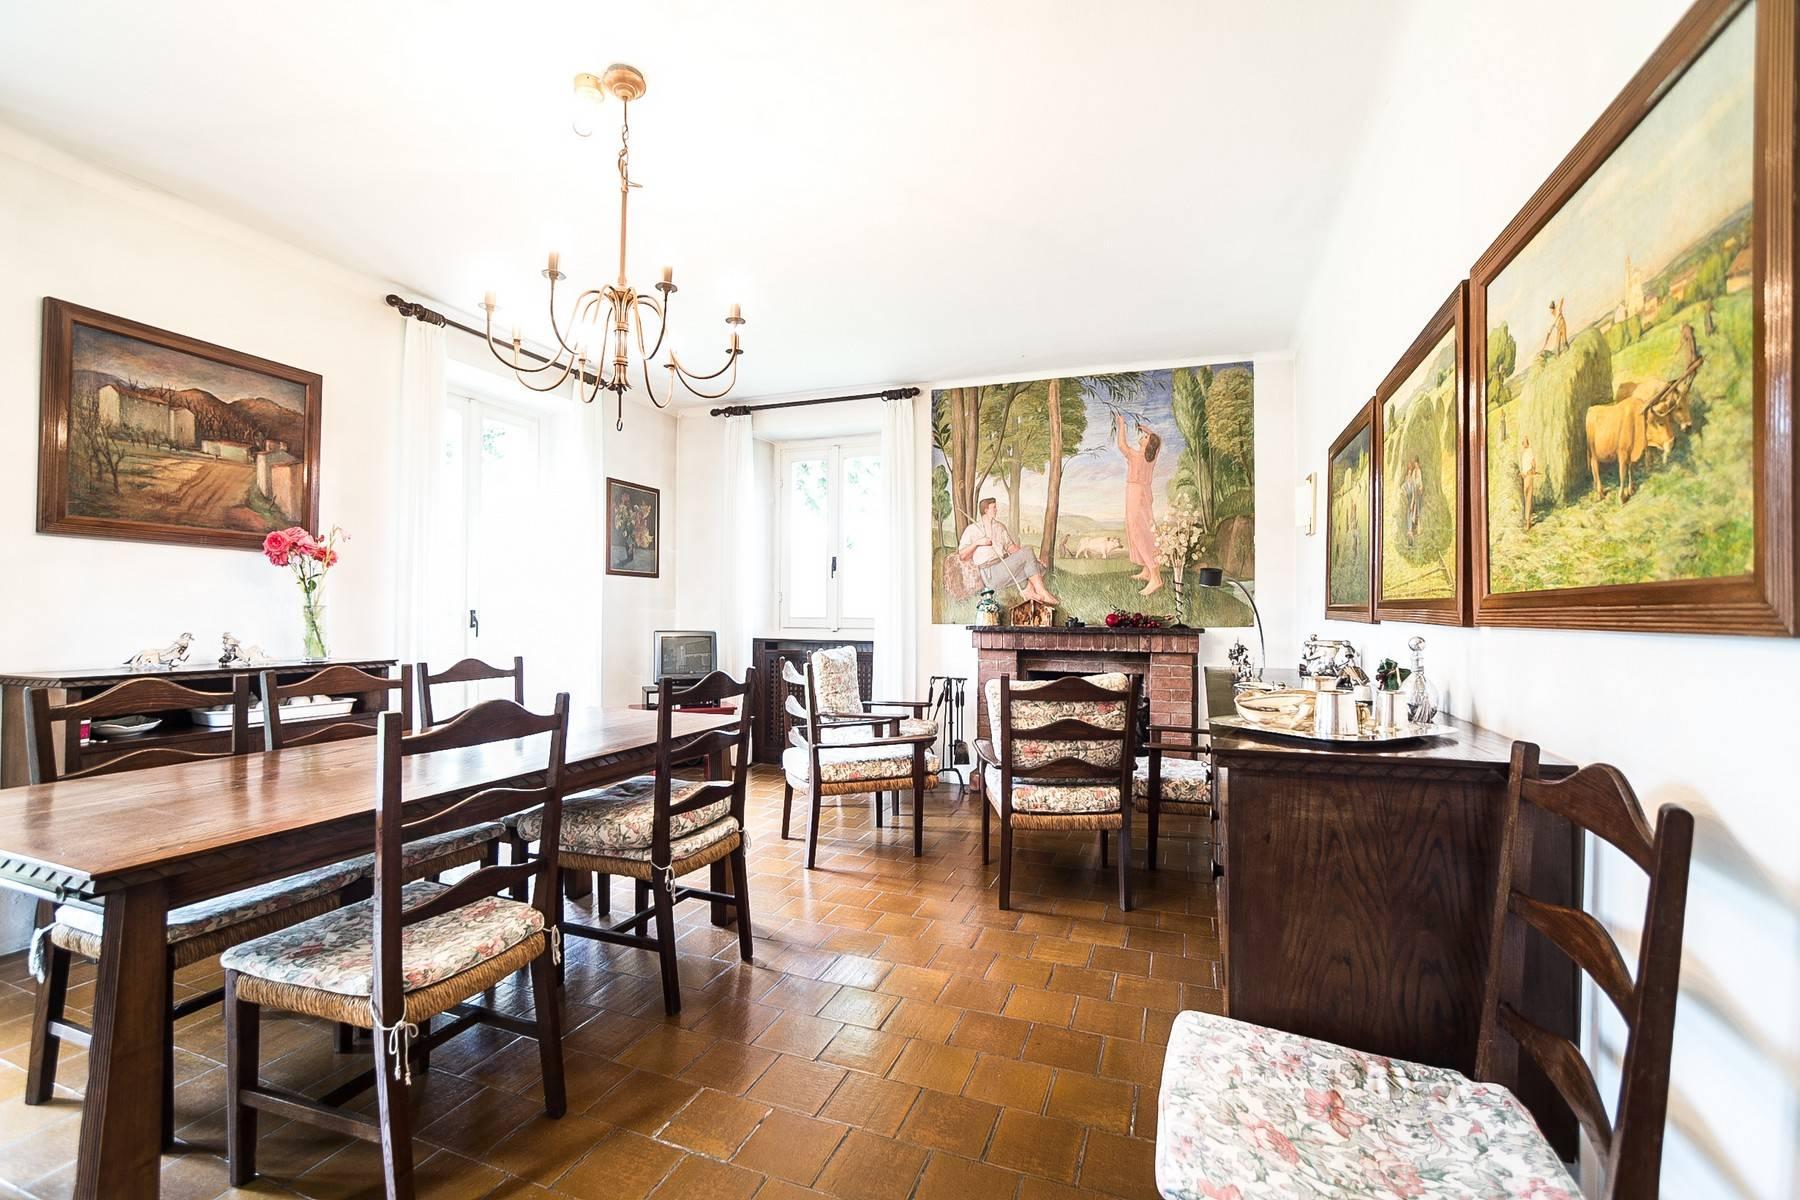 Villa in Vendita a Carimate: 5 locali, 800 mq - Foto 11